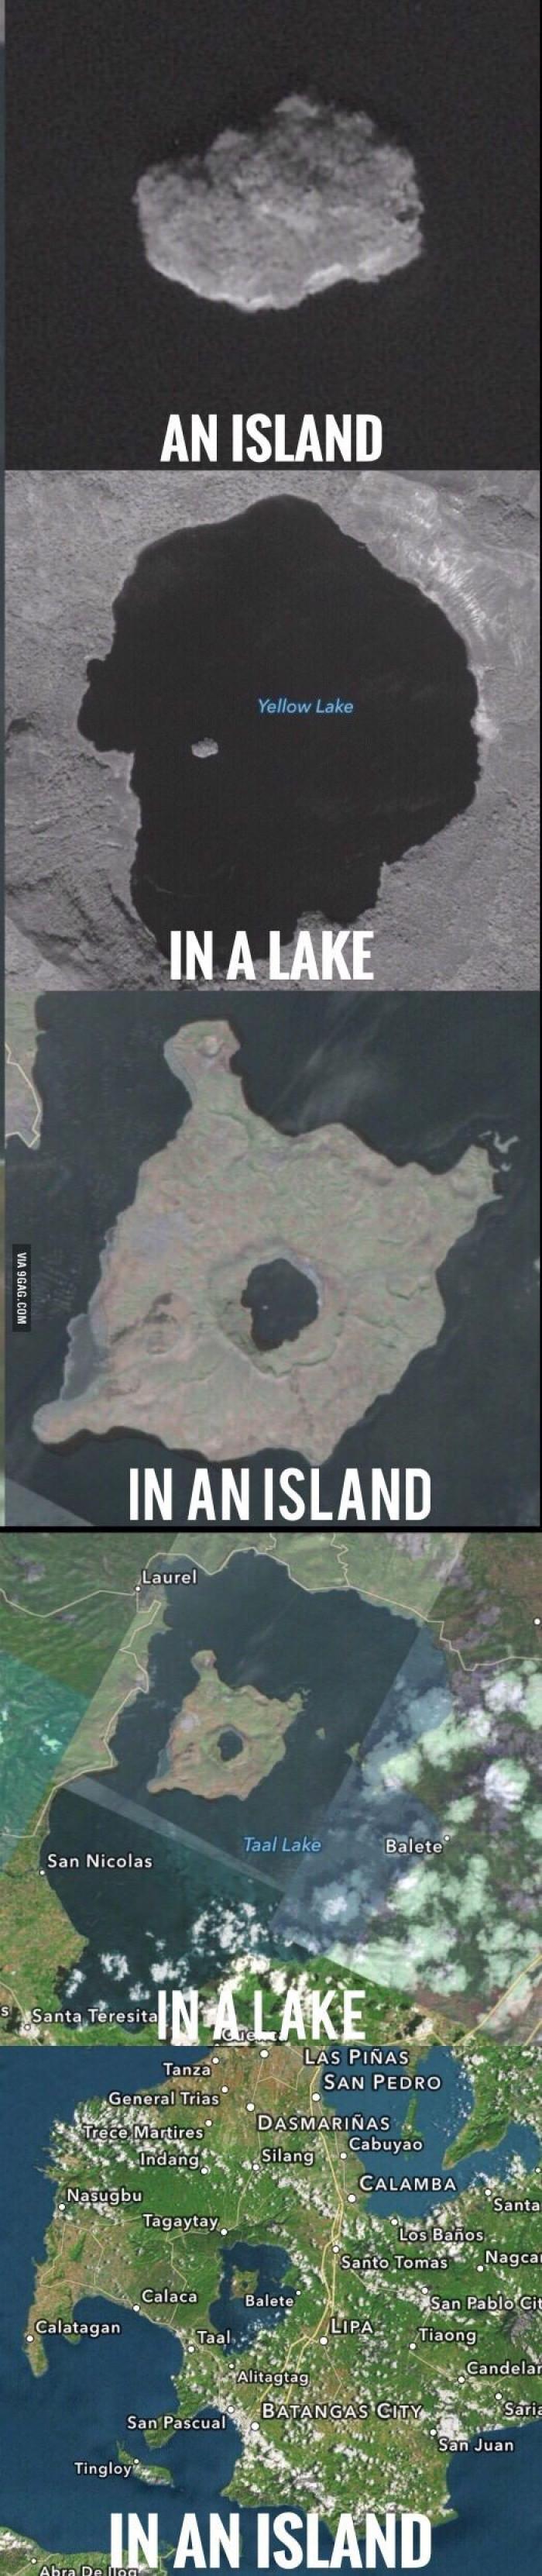 Island Inception - We Need To Go Deeper!